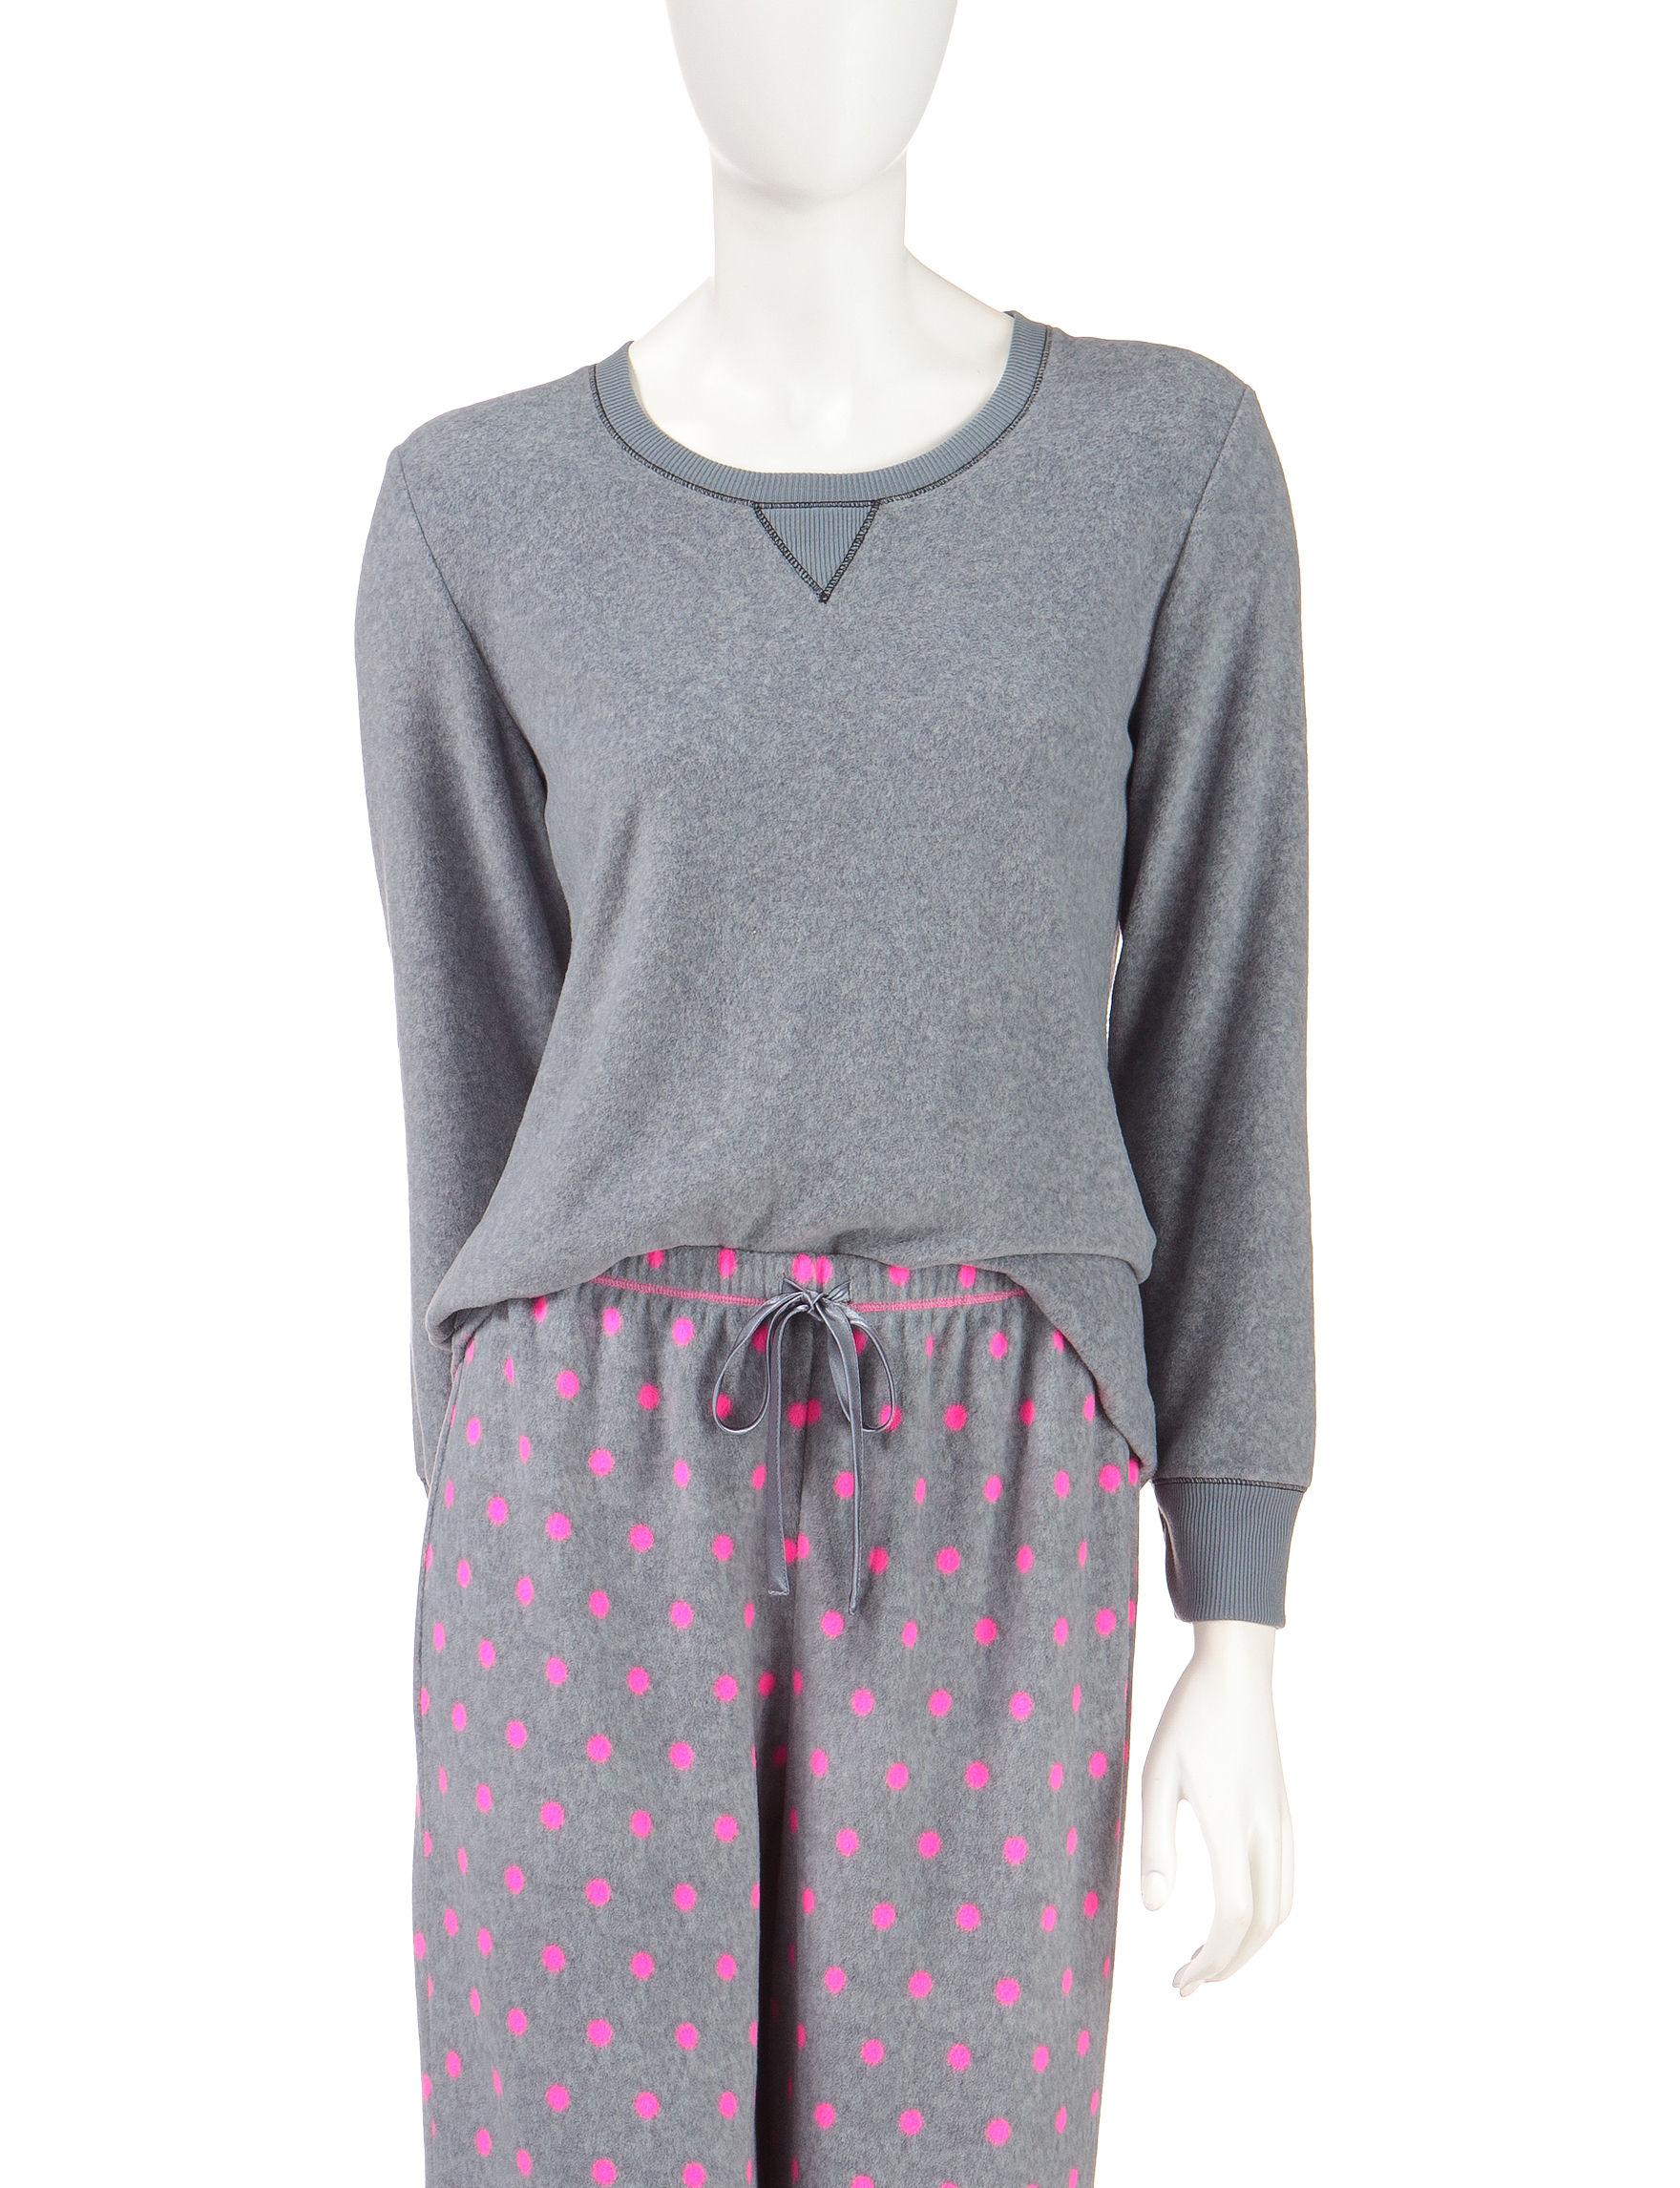 Jaclyn Intimates Heather Grey Pajama Tops